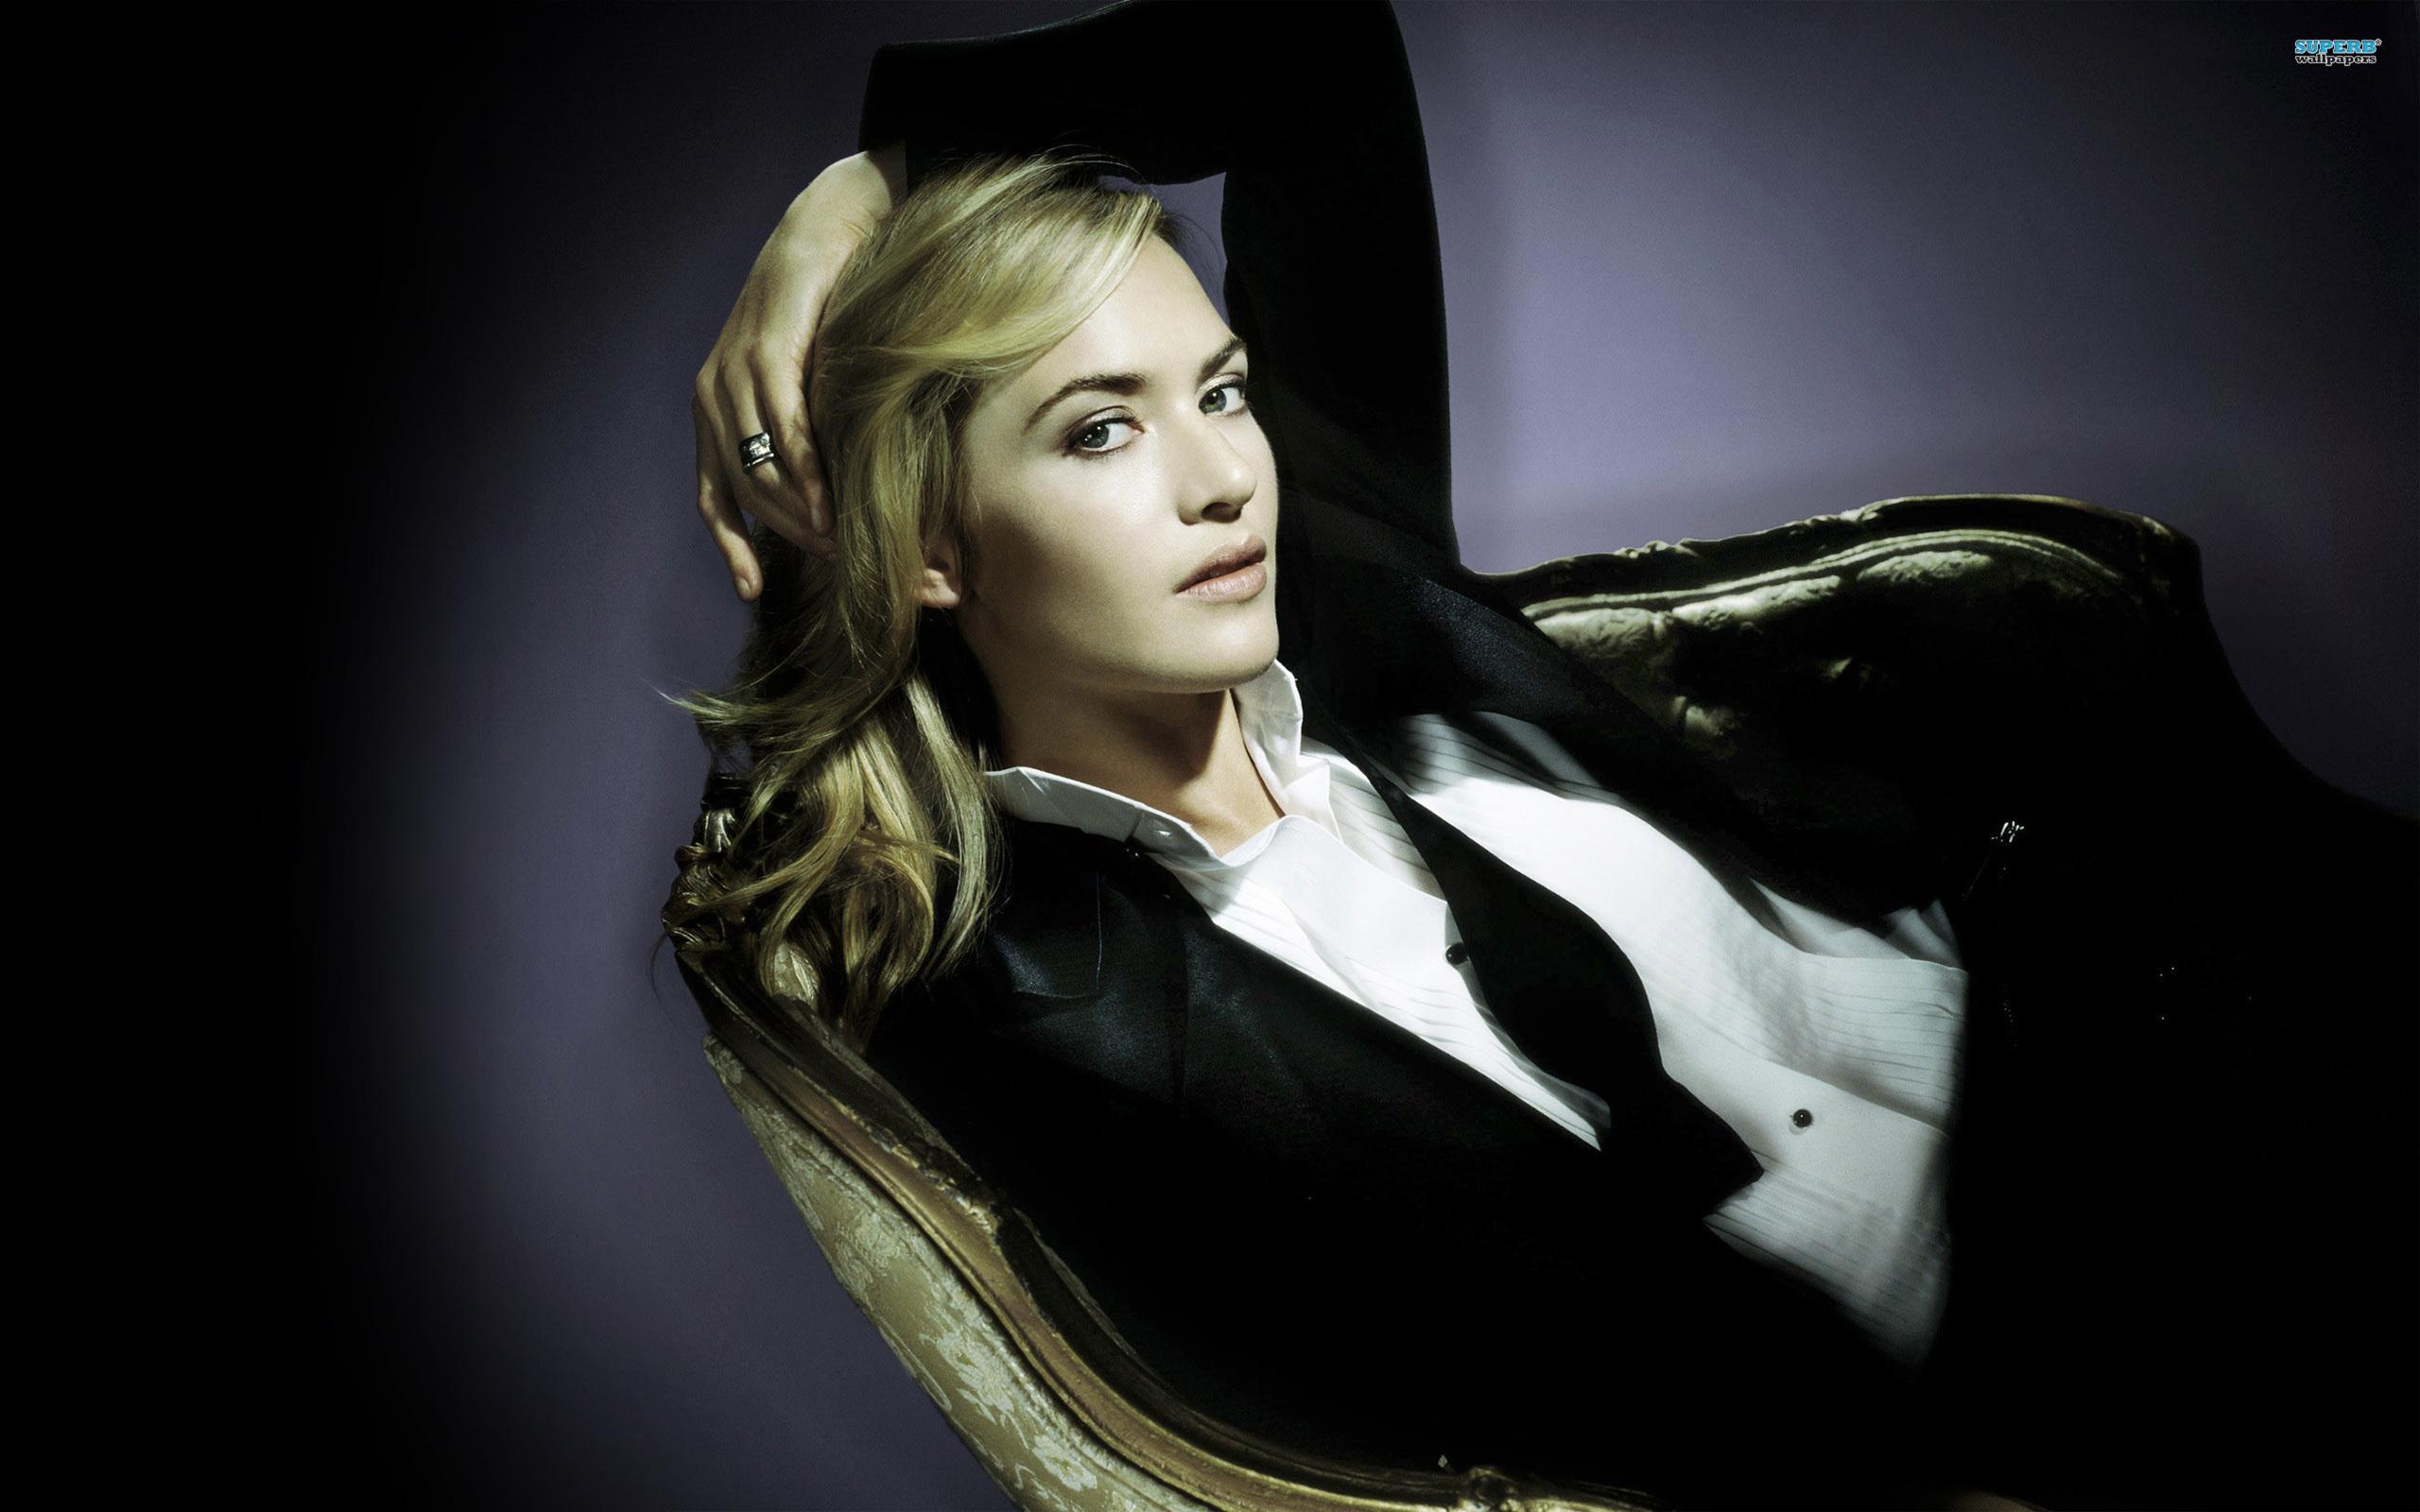 best images about Kate Winslet on Pinterest Leonardo